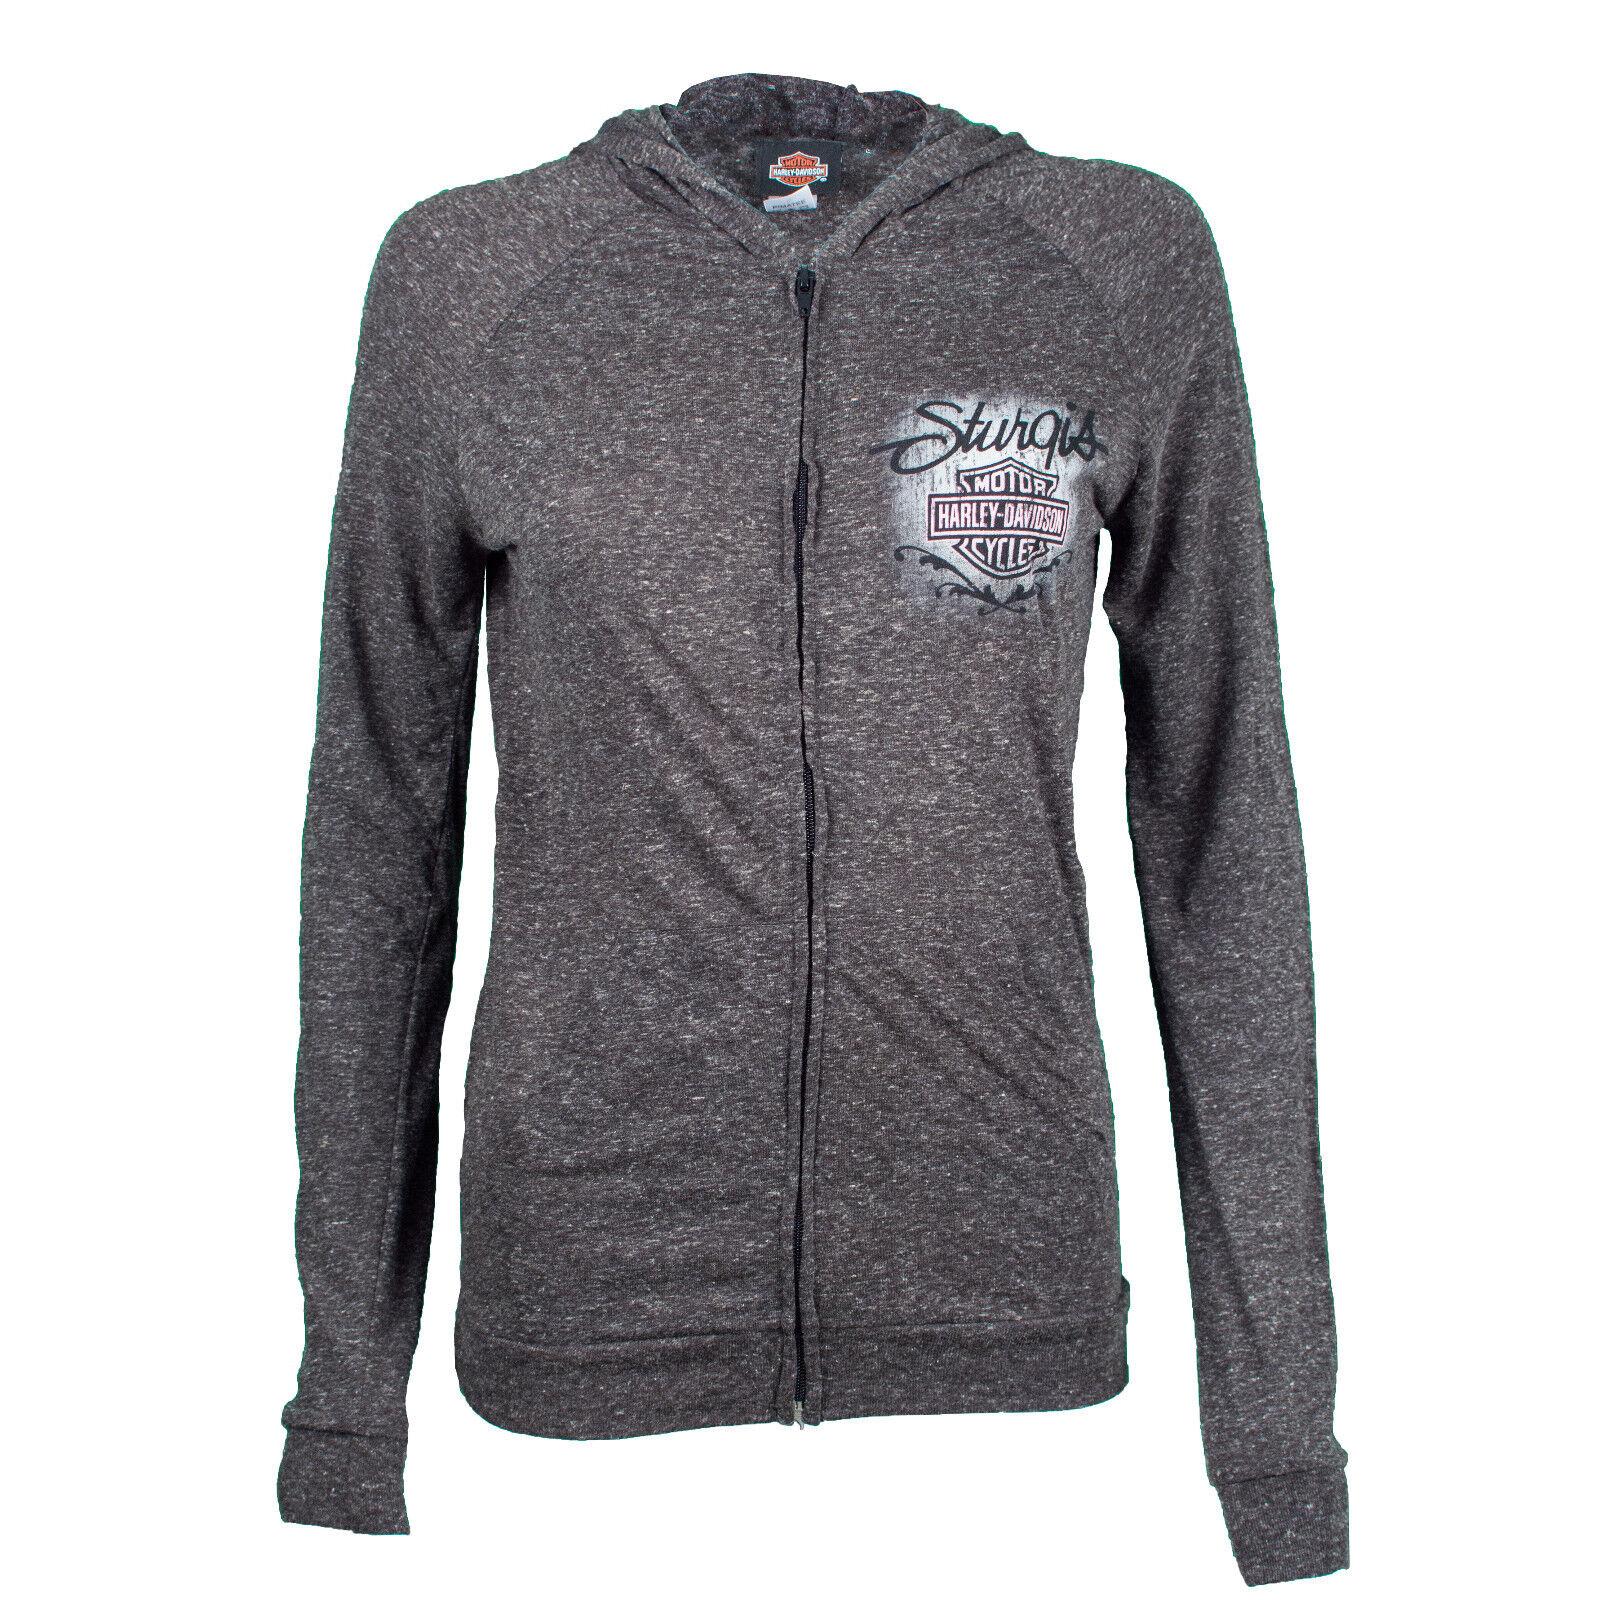 Sturgis Harley Davidson® Women's Sturgis Wash Lightweight Grey Zip Up Hoodie